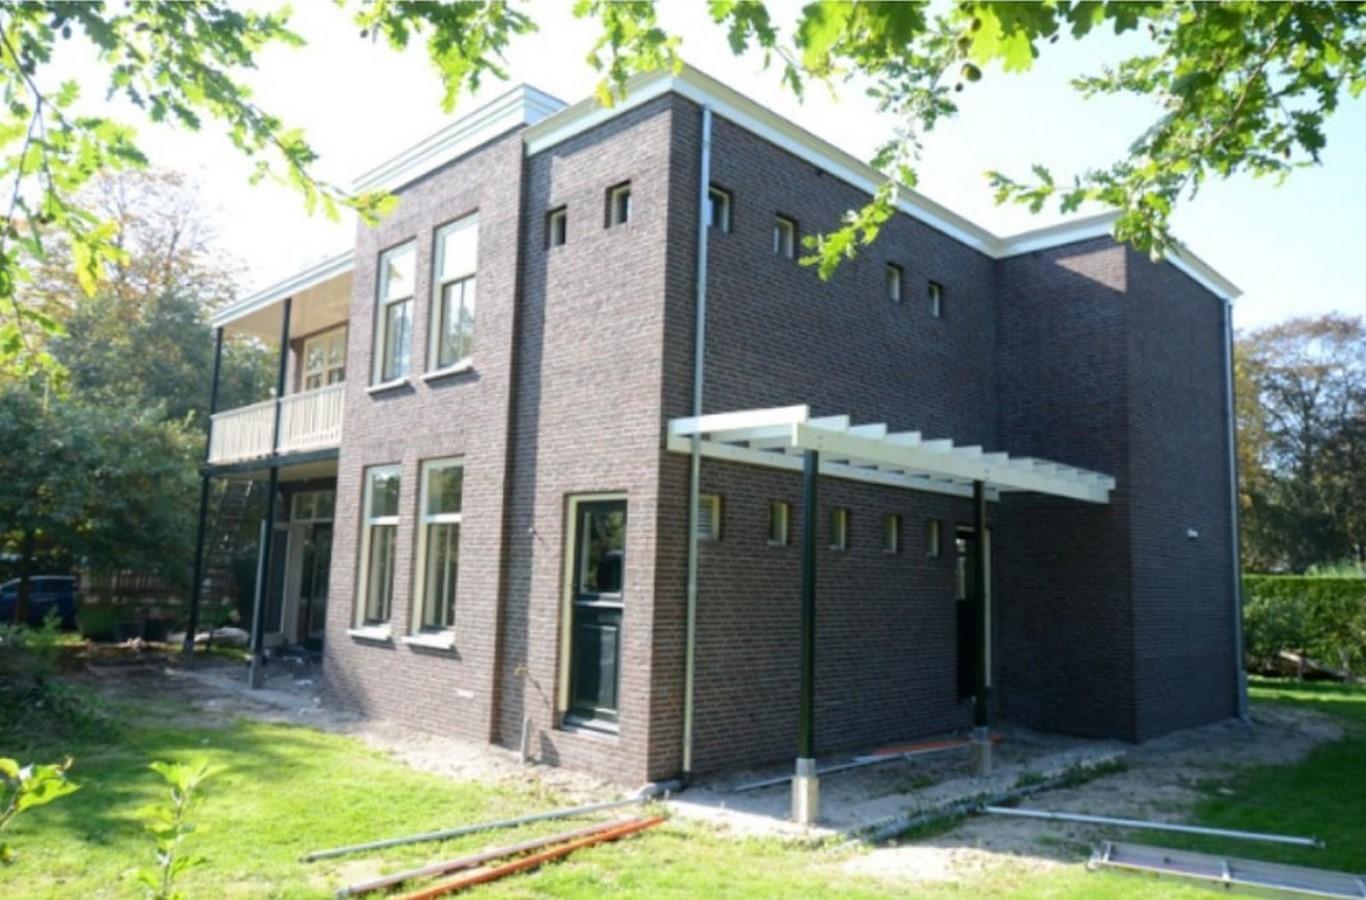 Architects in Leiden - Top 45 Architects in Leiden - Sheet6